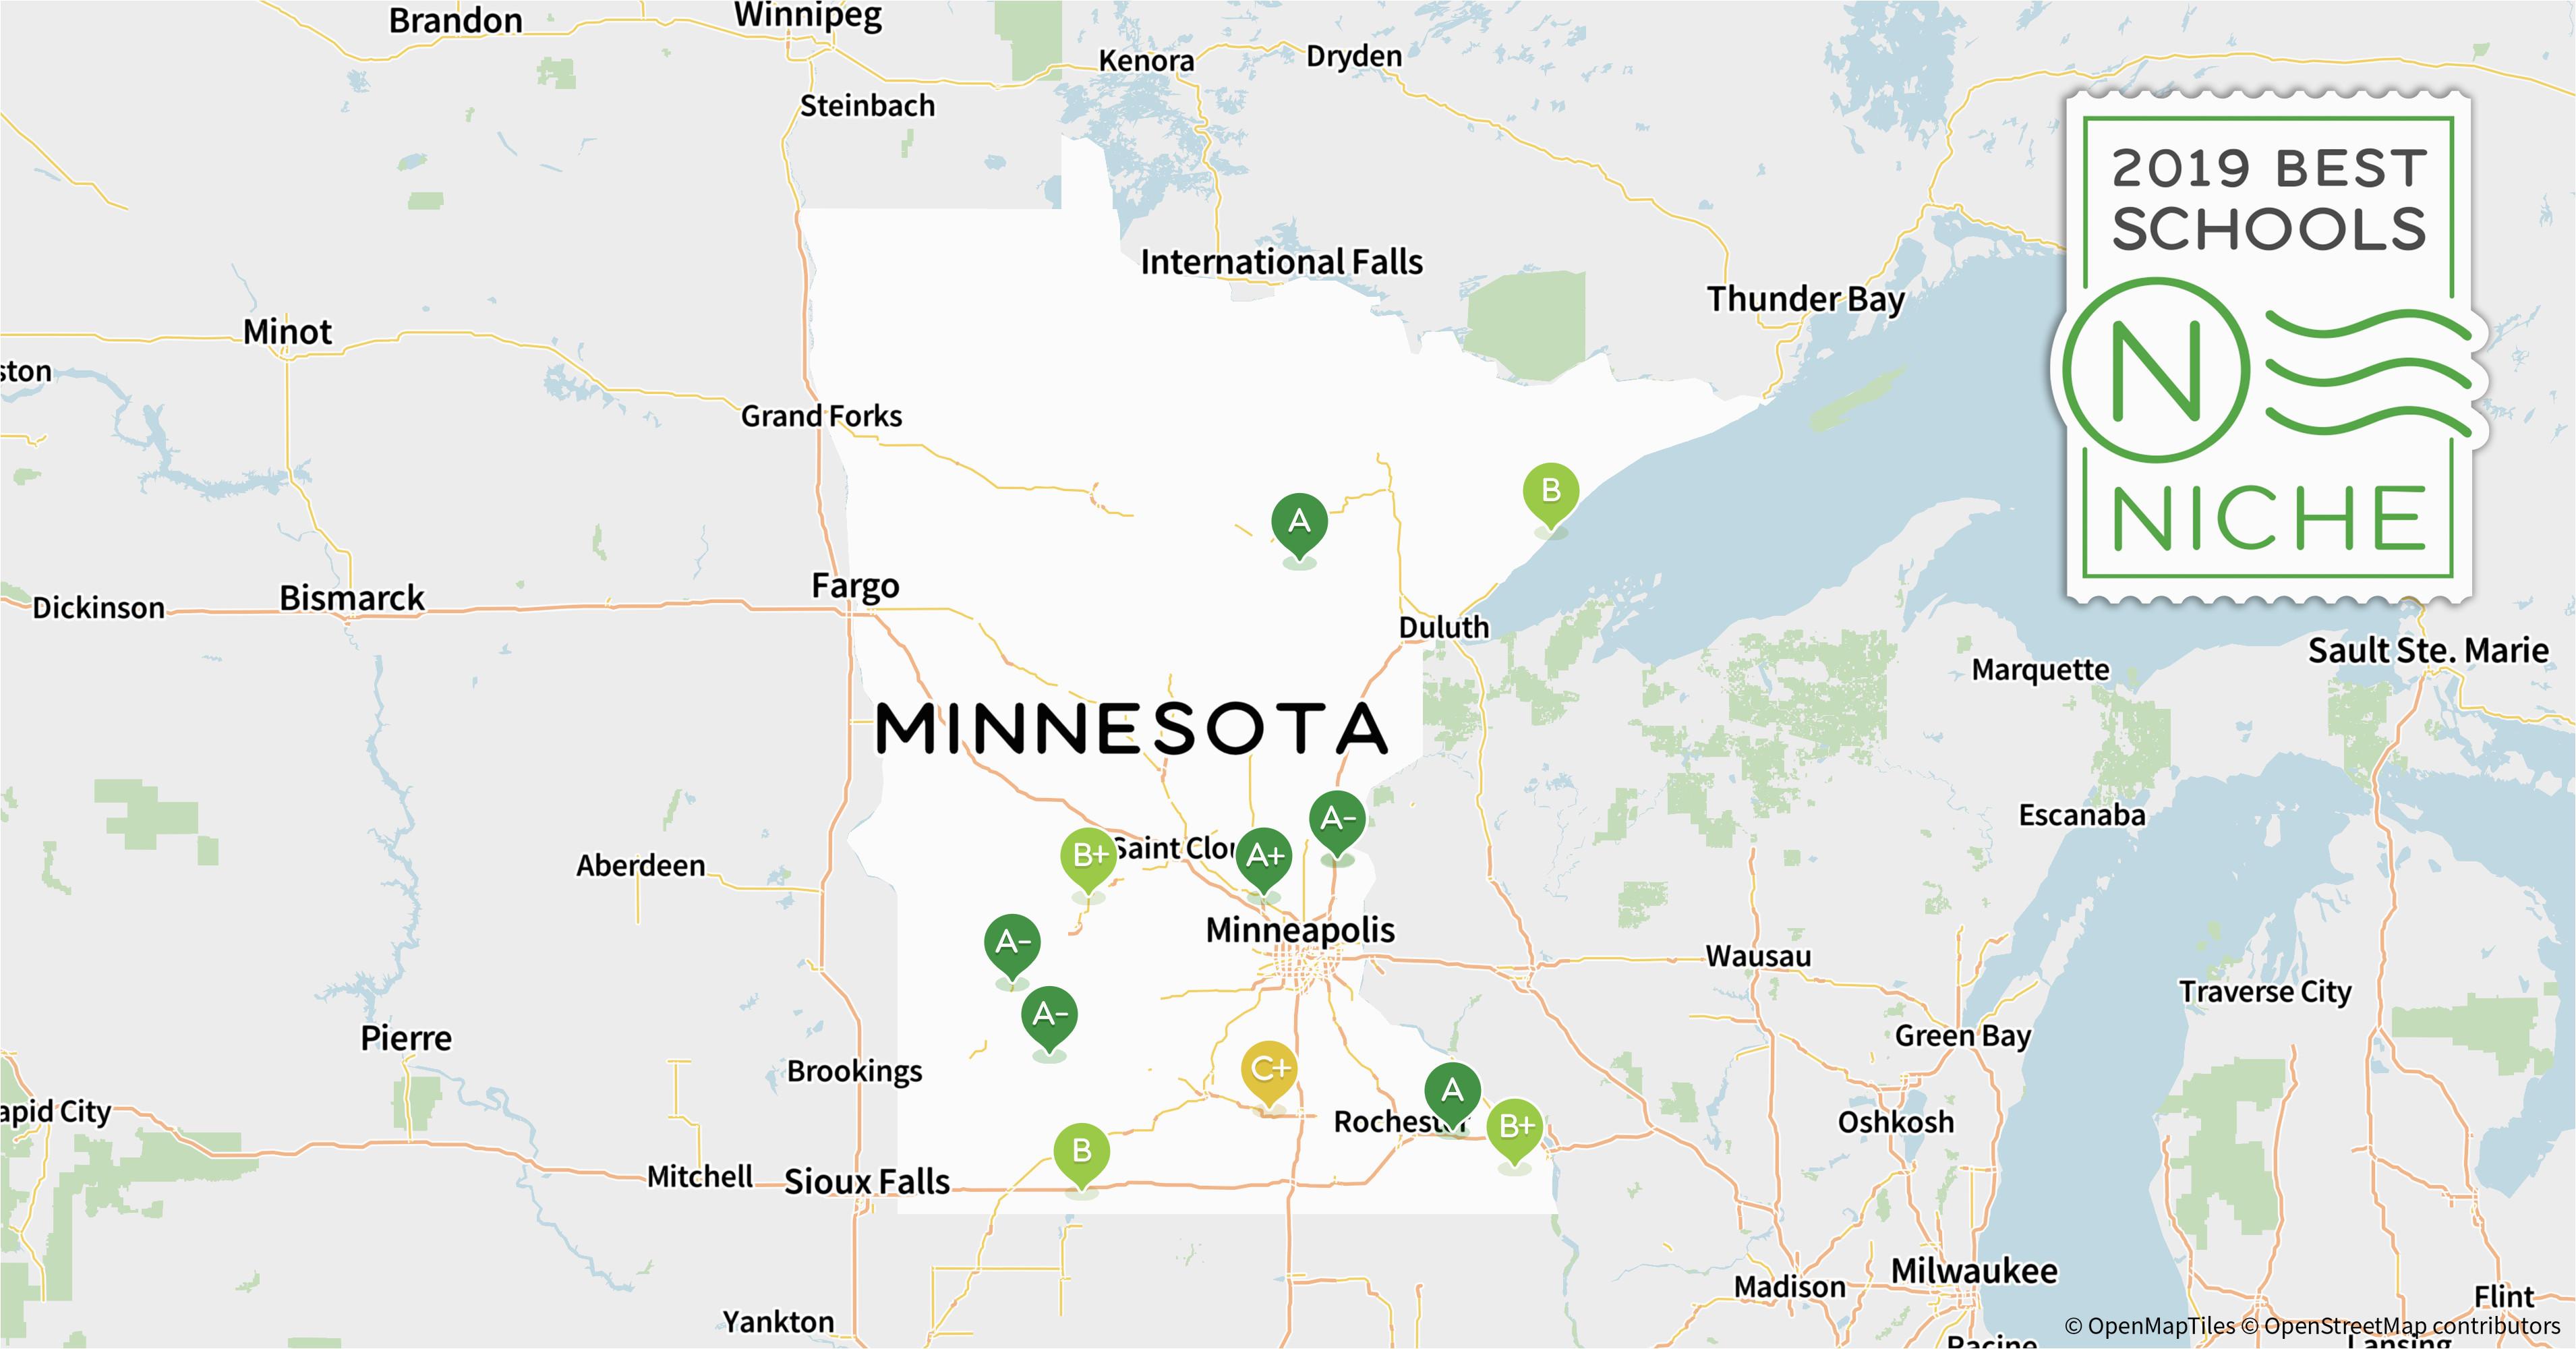 Map Of Minnesota School Districts 2019 Best Private High Schools In Minnesota Niche